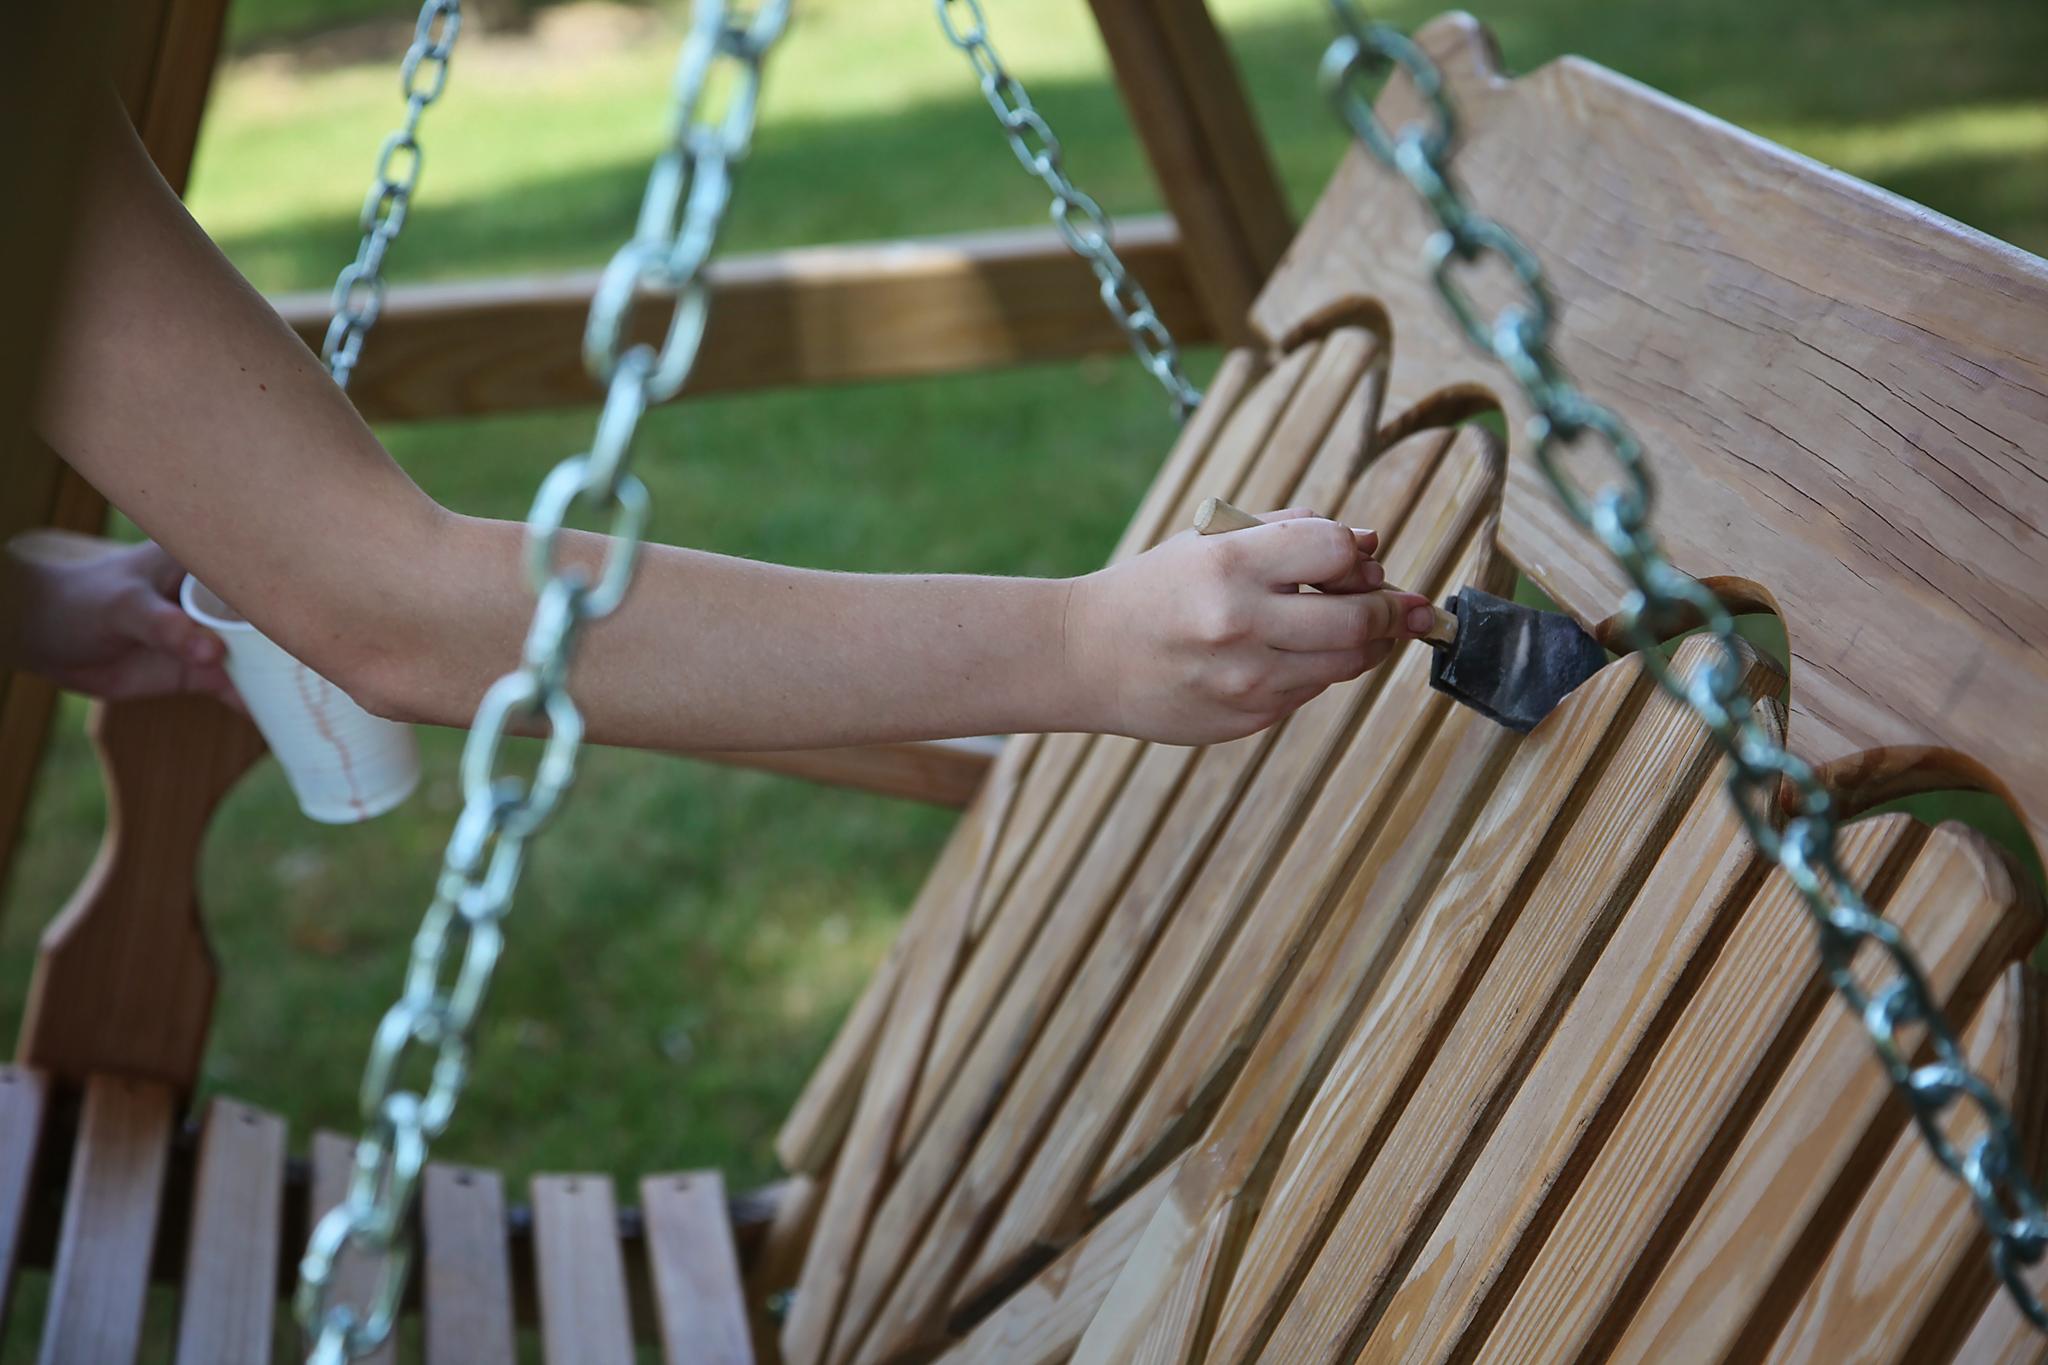 Tutorial: Staining Pressure Treated Pine Furniture ...